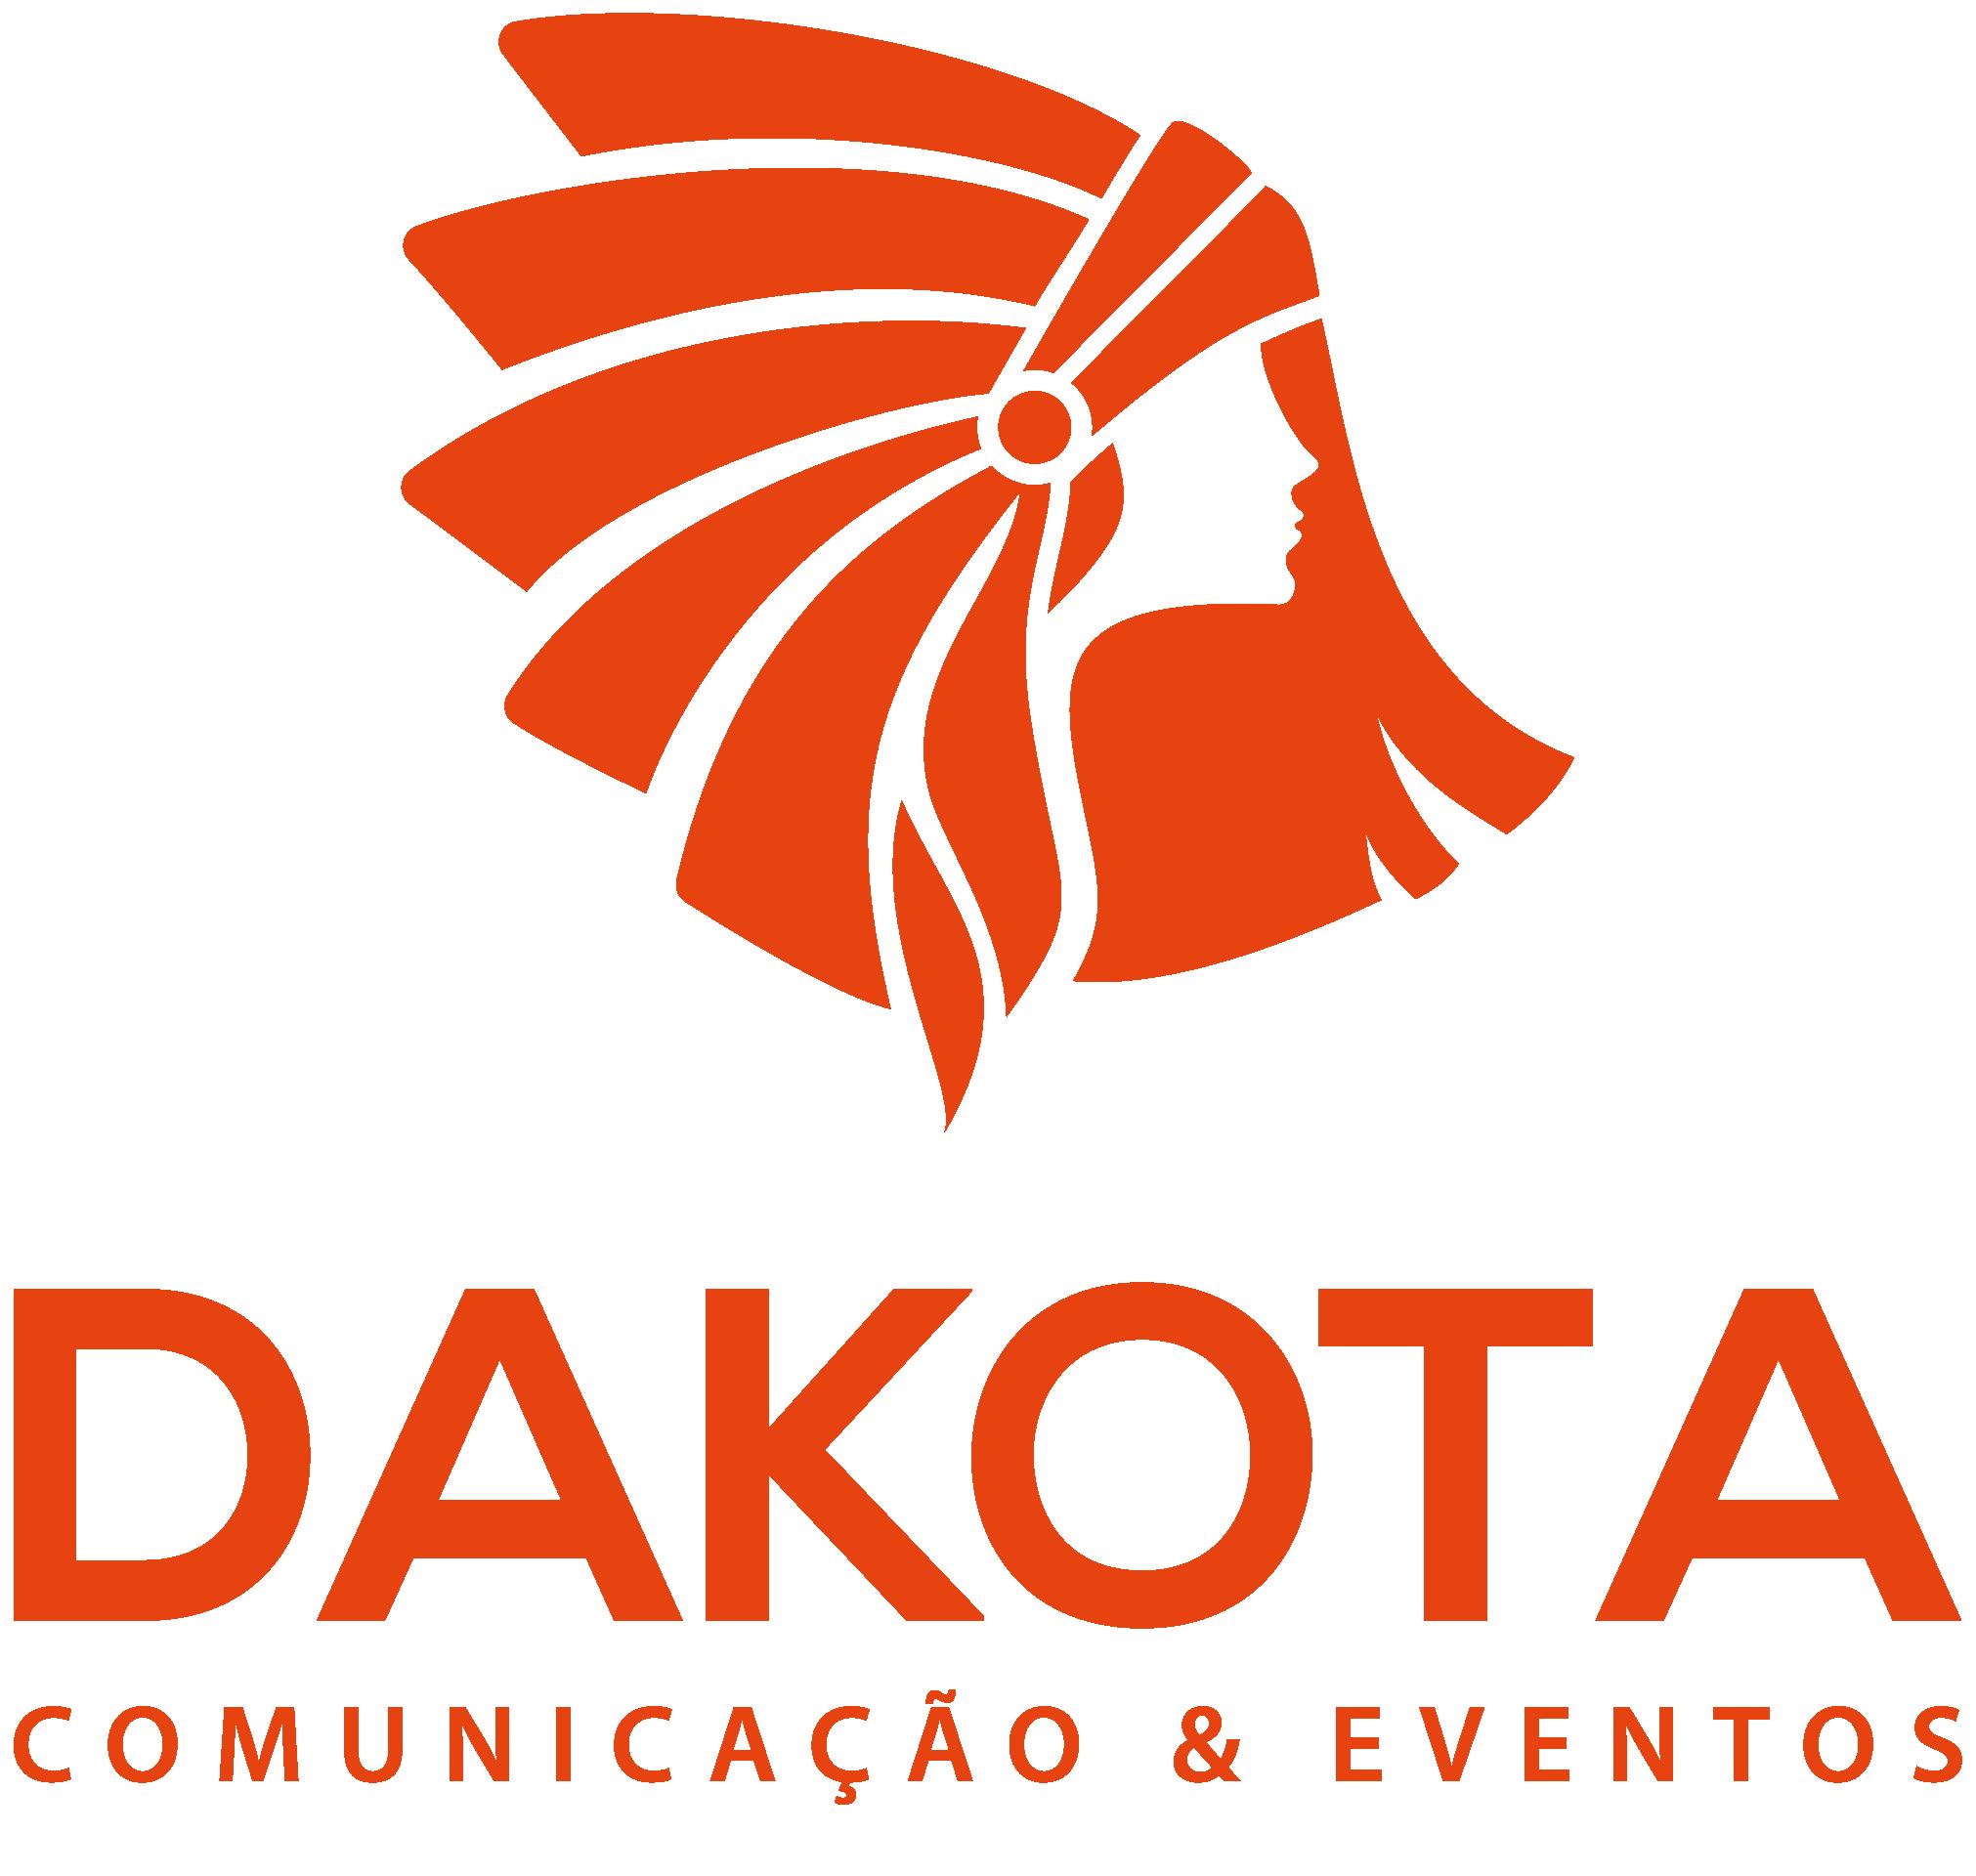 Agencia Dakota